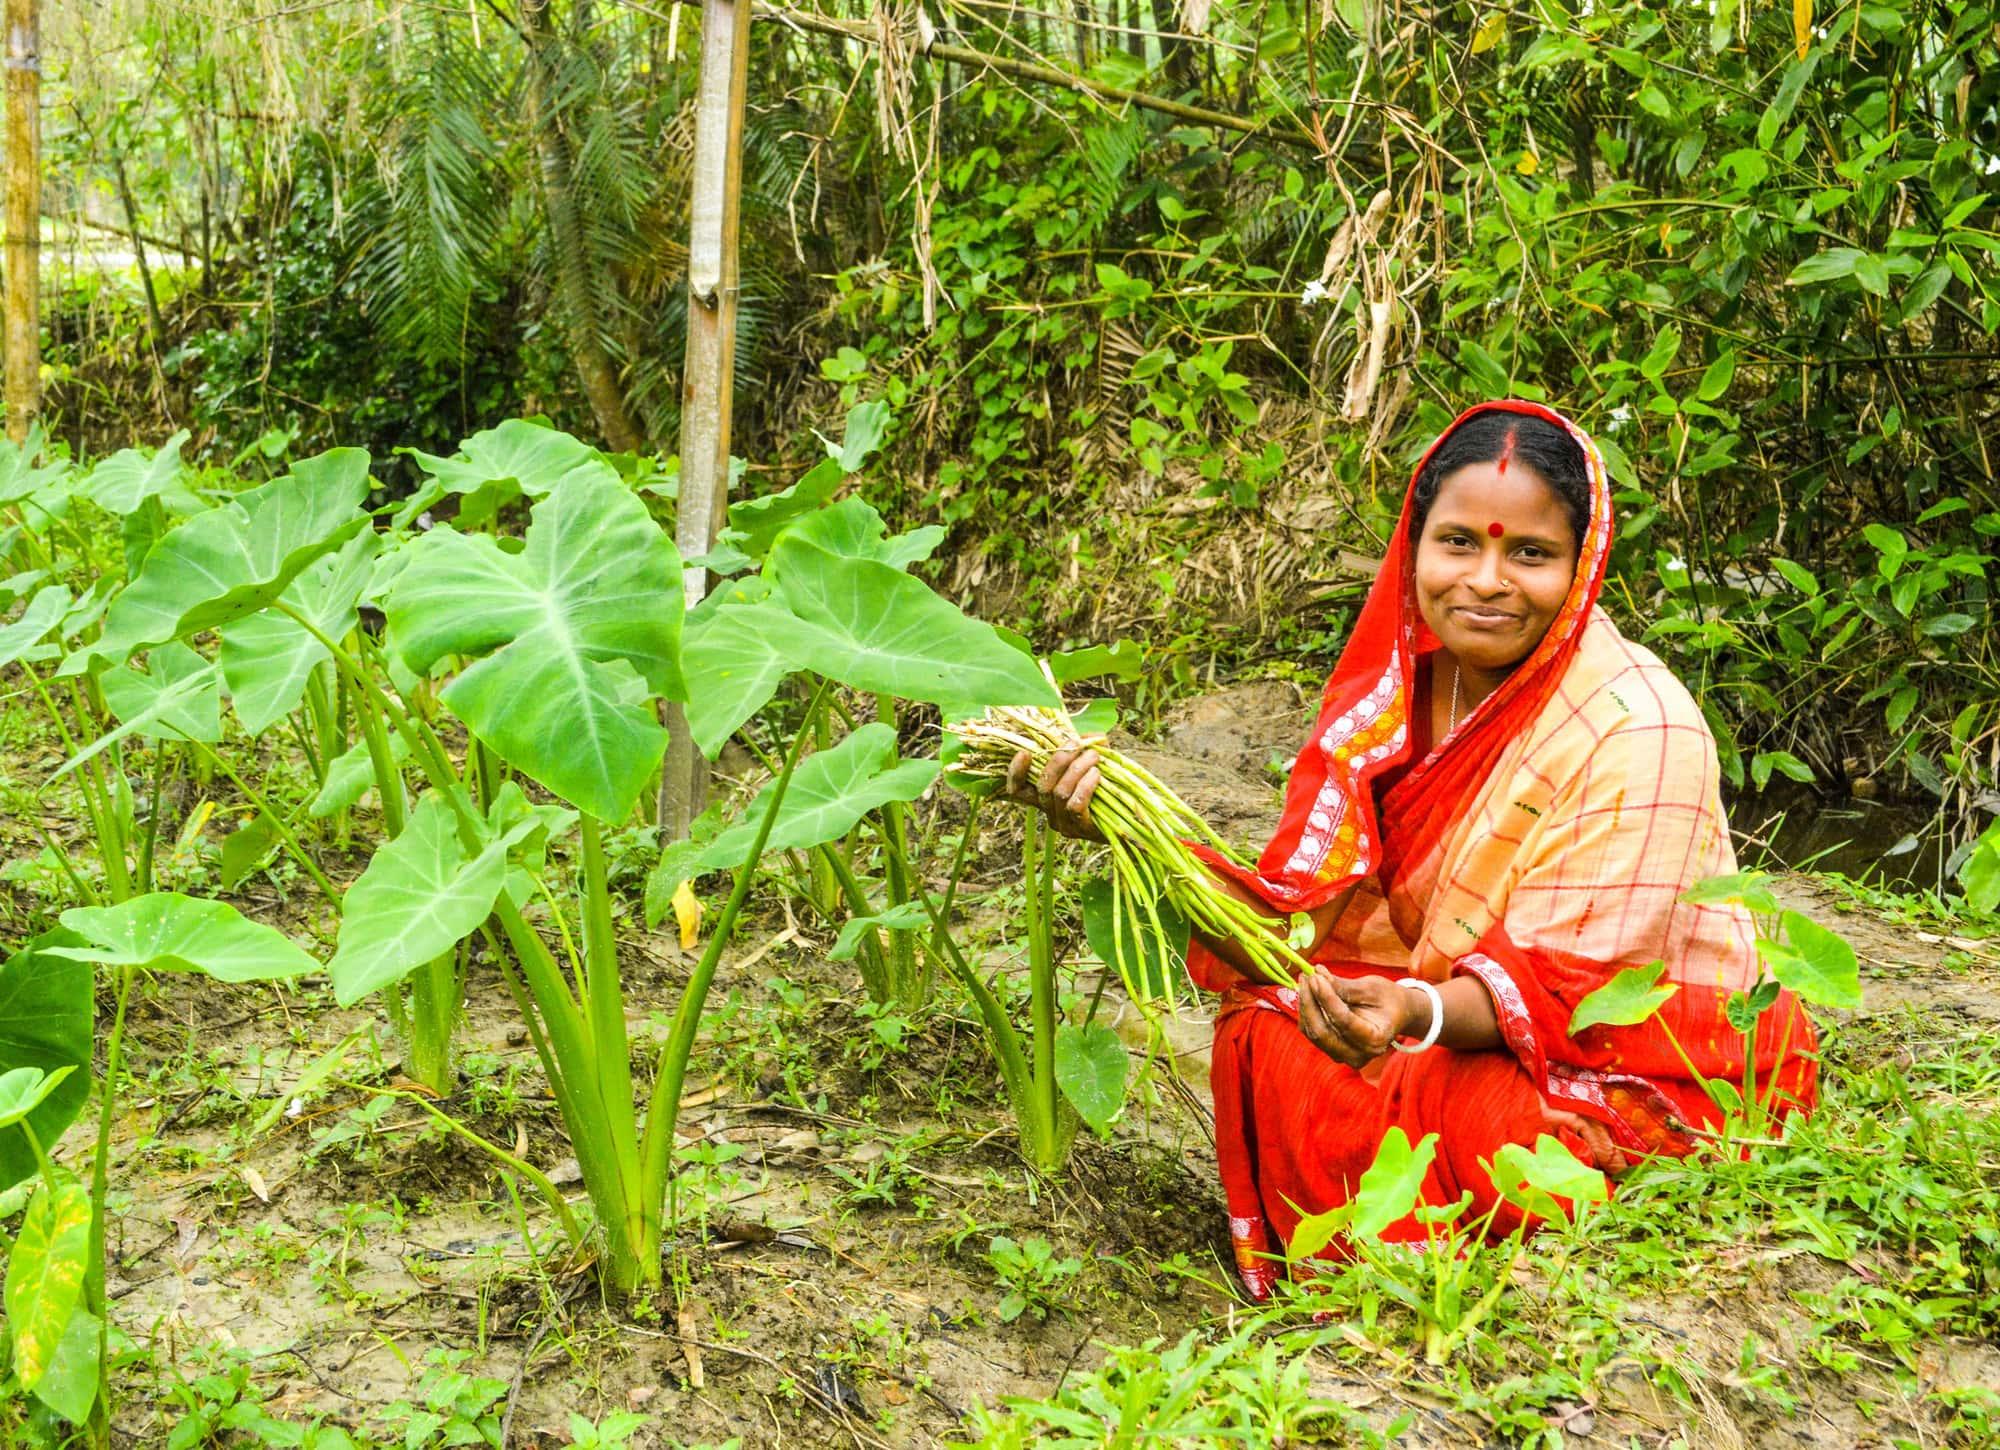 Harvesting veg in Bangladesh - WorldFish - M.Rahman